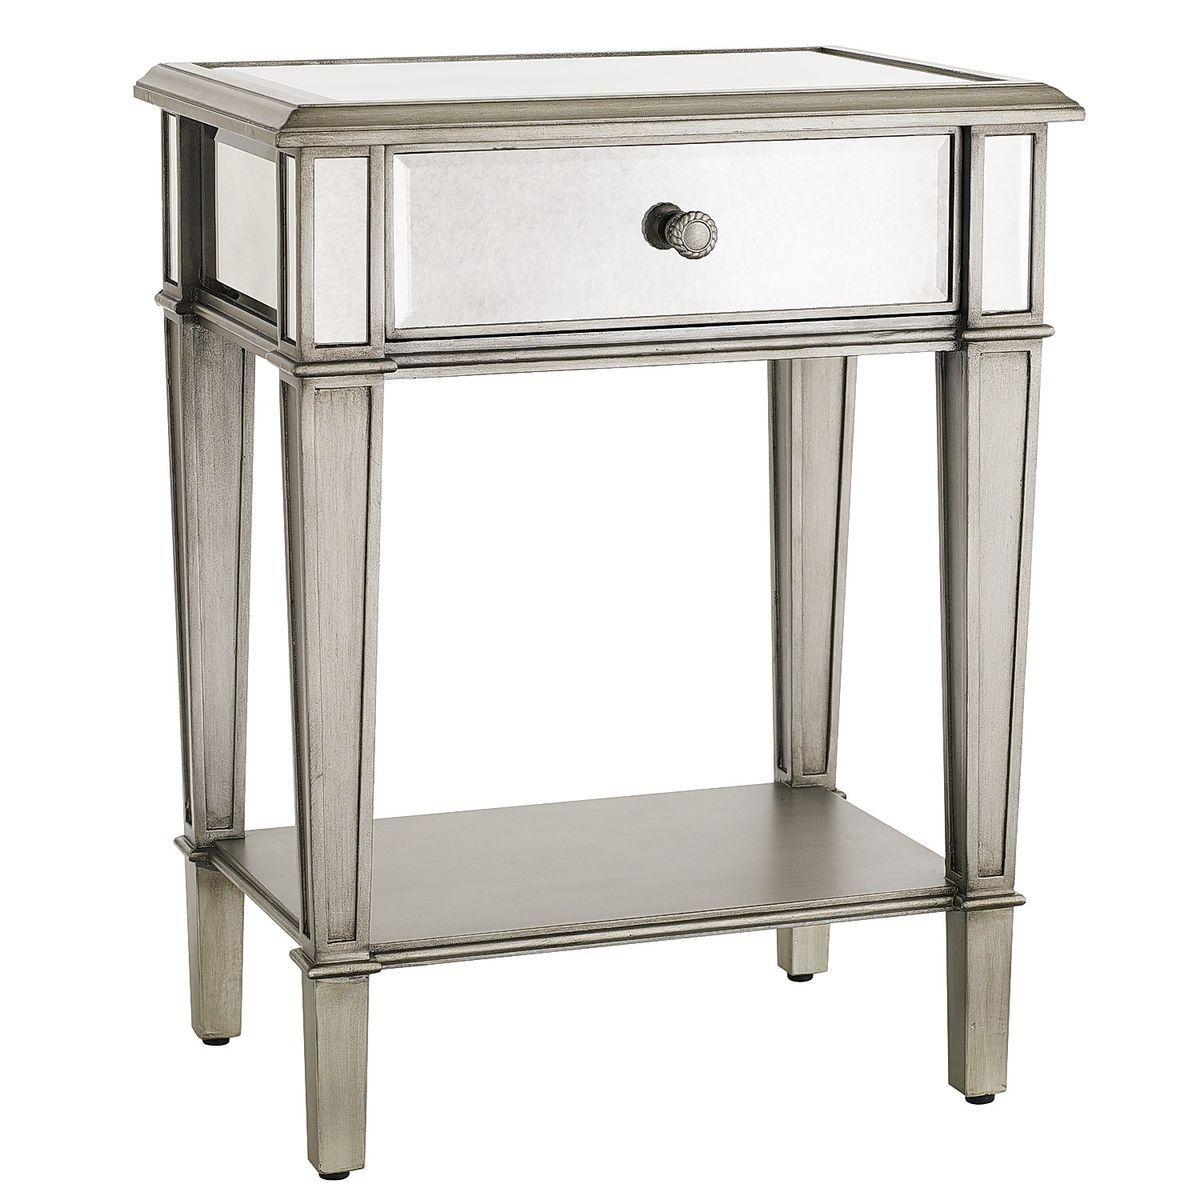 Hayworth Mirrored Silver Nightstand Mirrored Nightstand